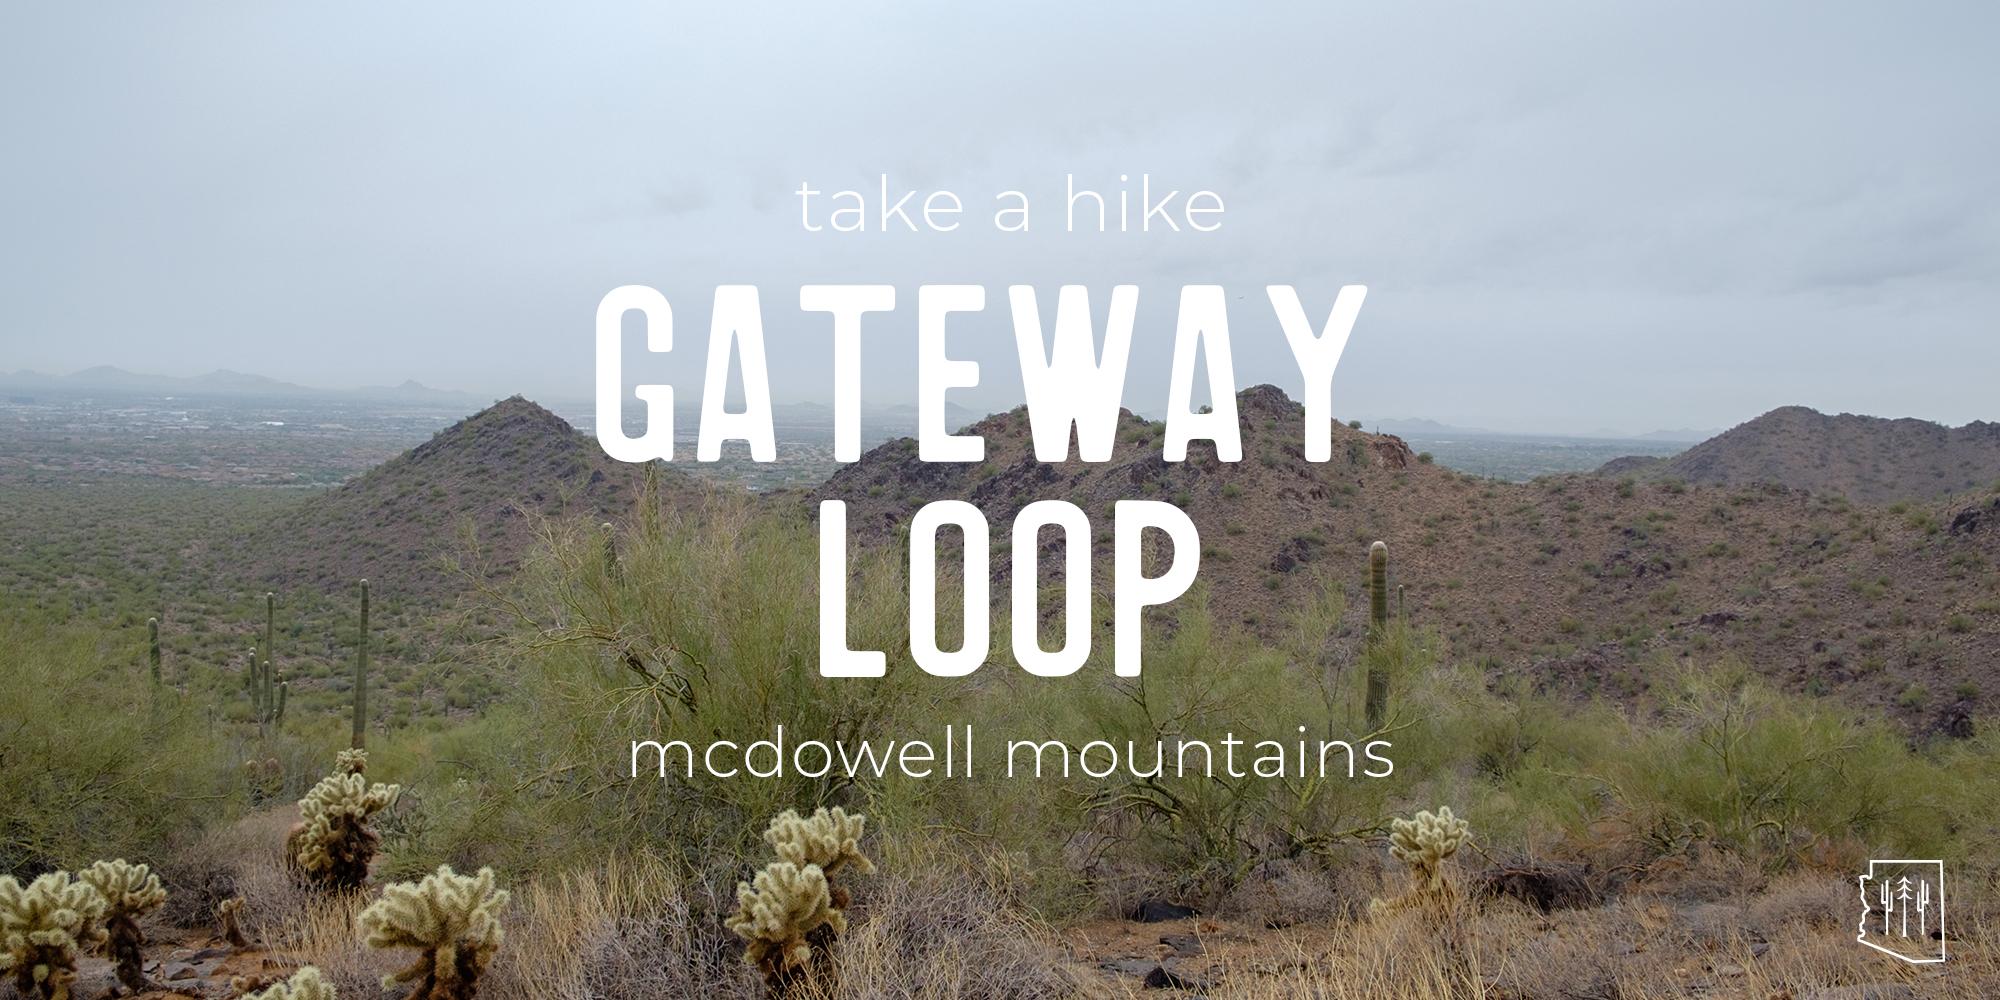 gatewayloop-116 - Erin Maxson.jpg